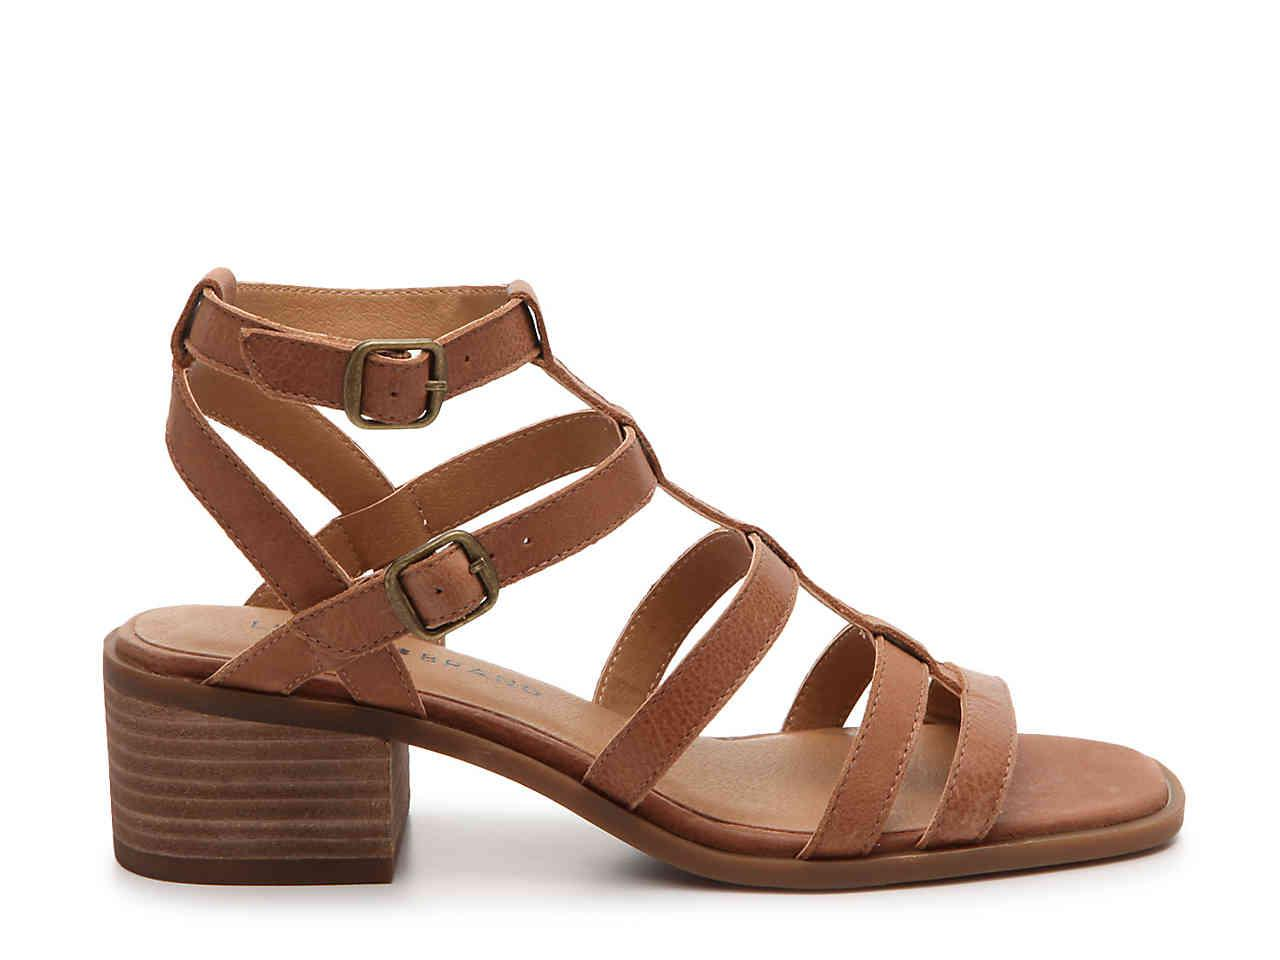 Lucky Brand Paytun Gladiator Sandal in